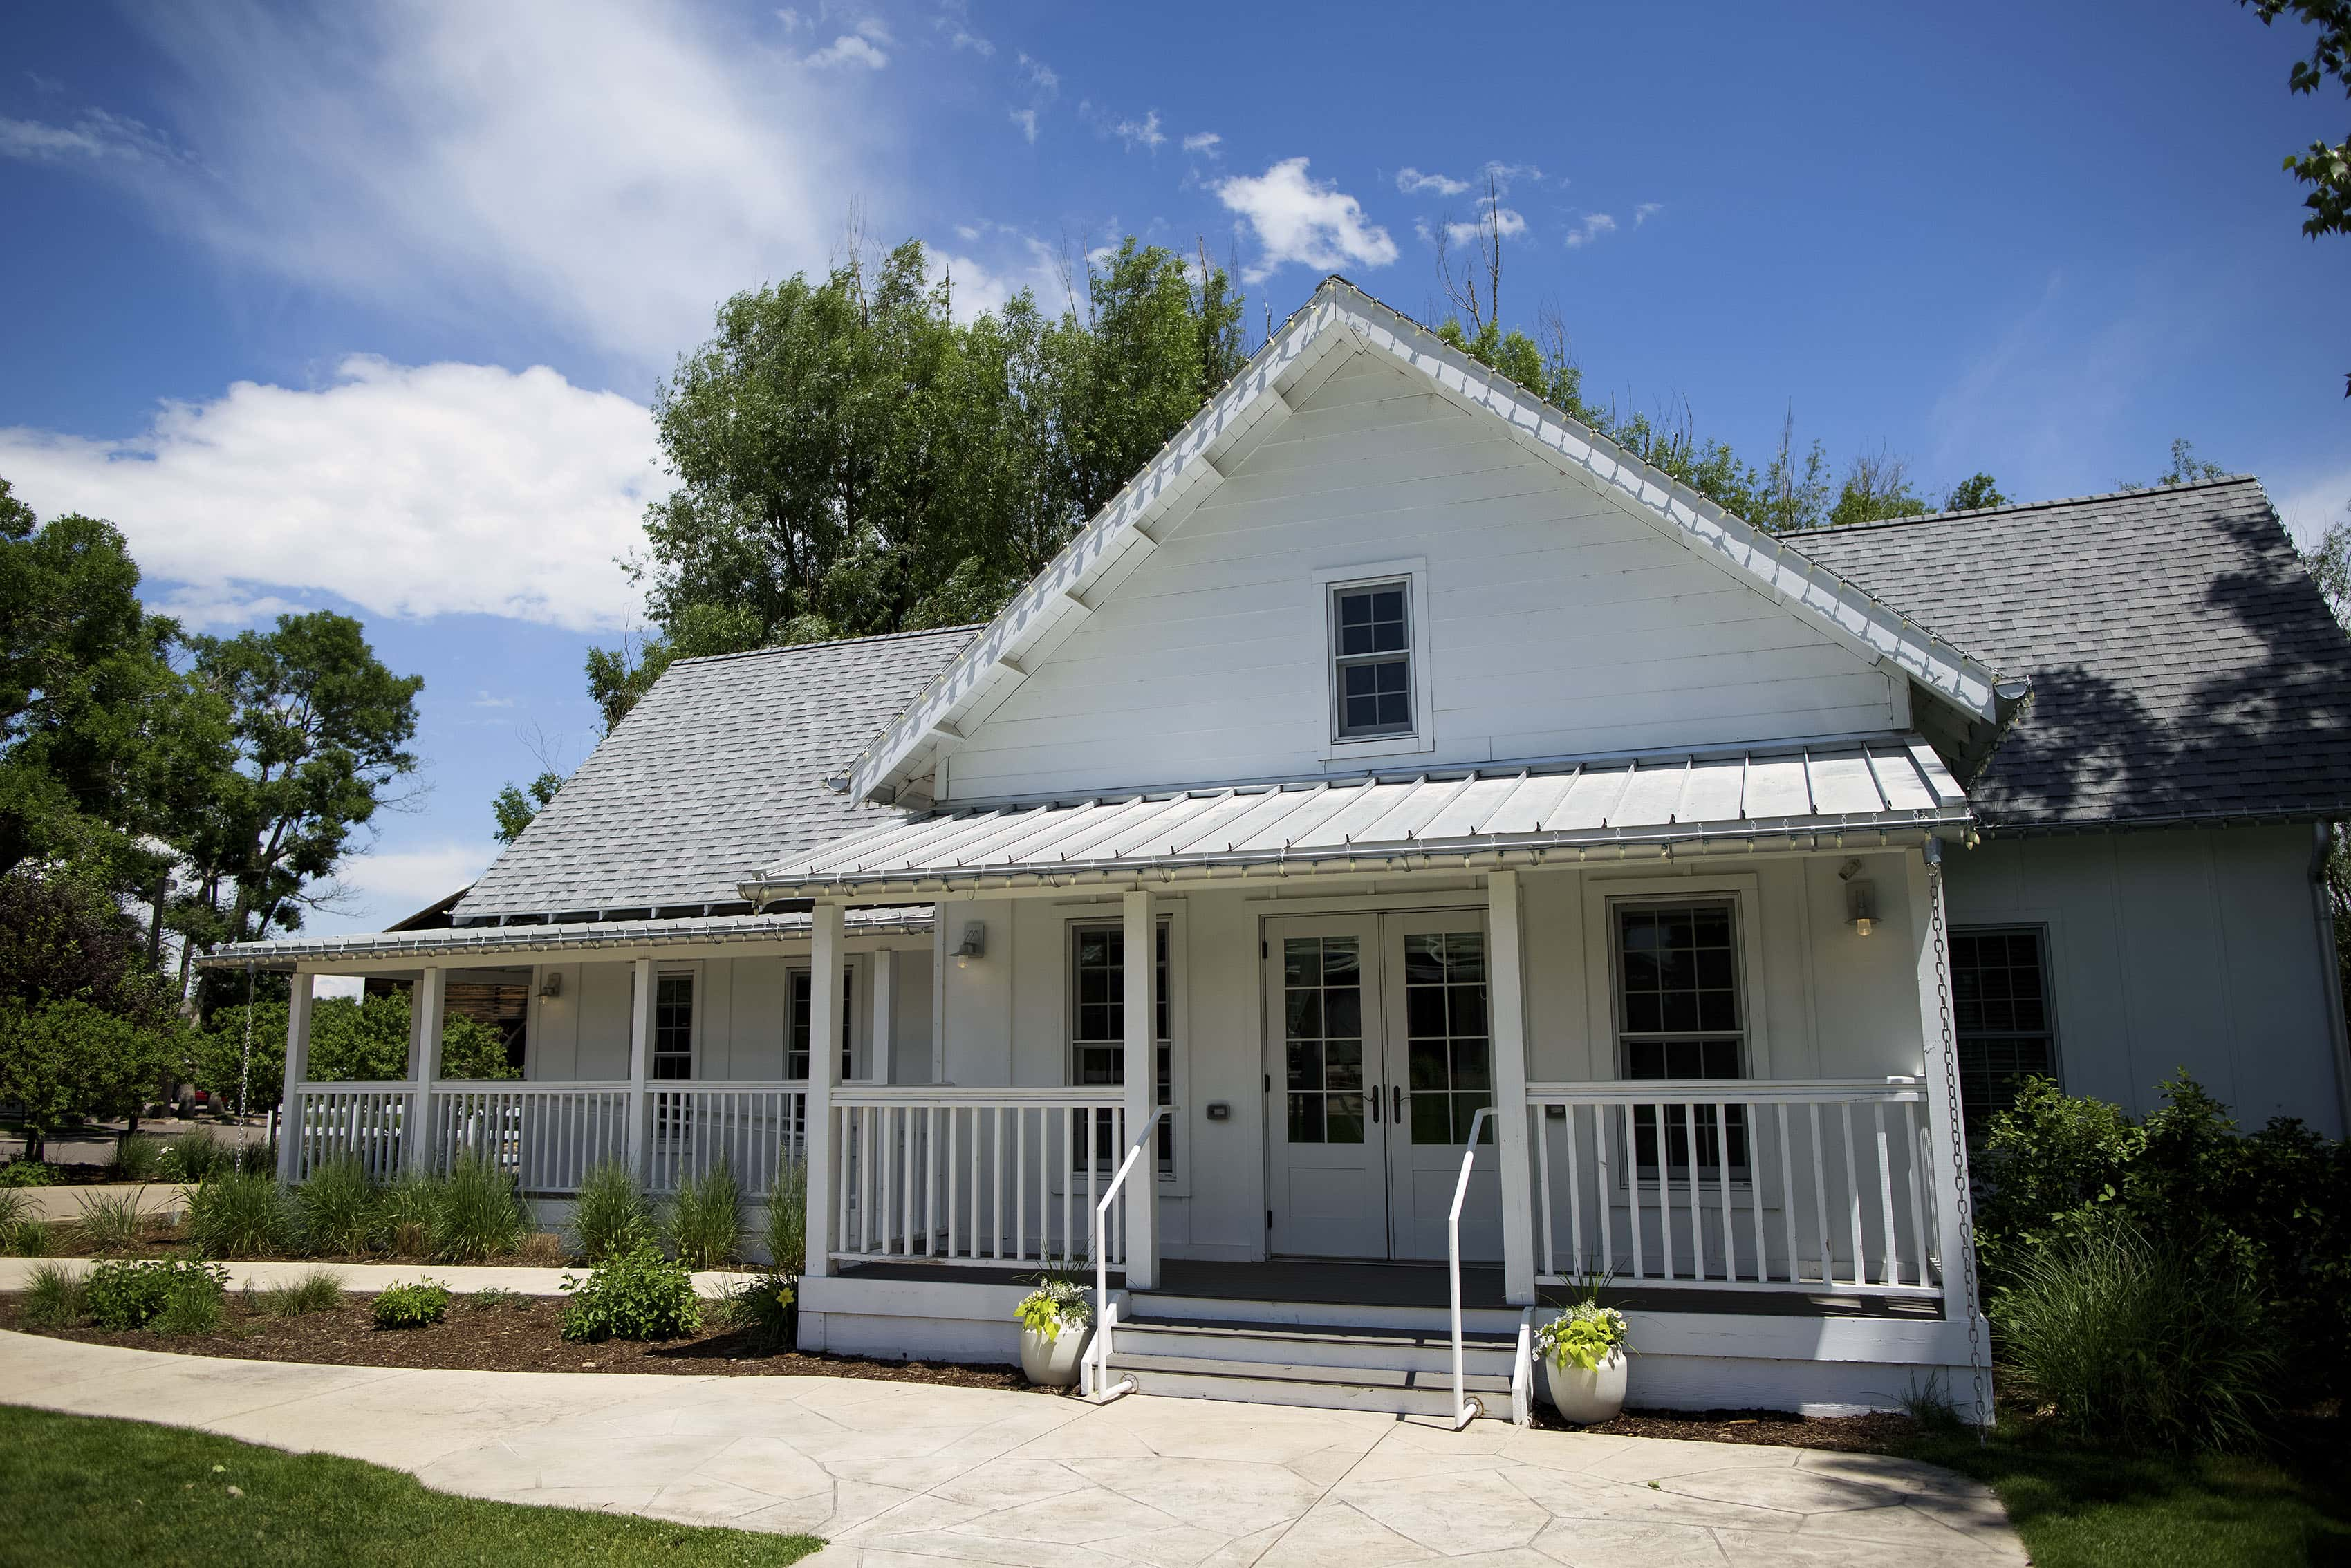 The Bridal cottage at The Barn at Raccoon Creek wedding venue